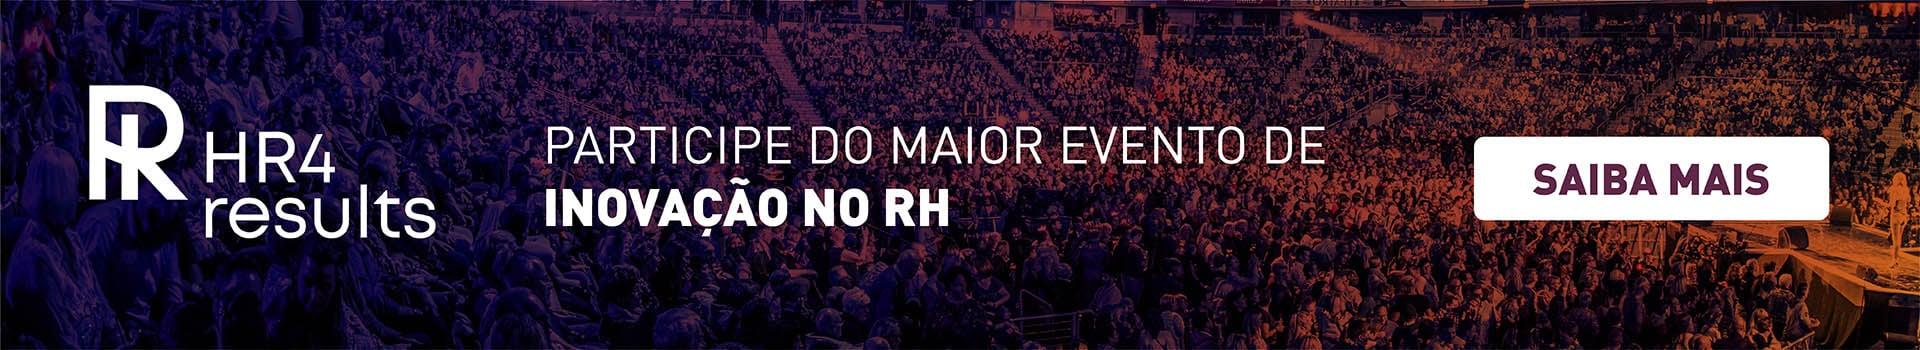 banner-hr4results